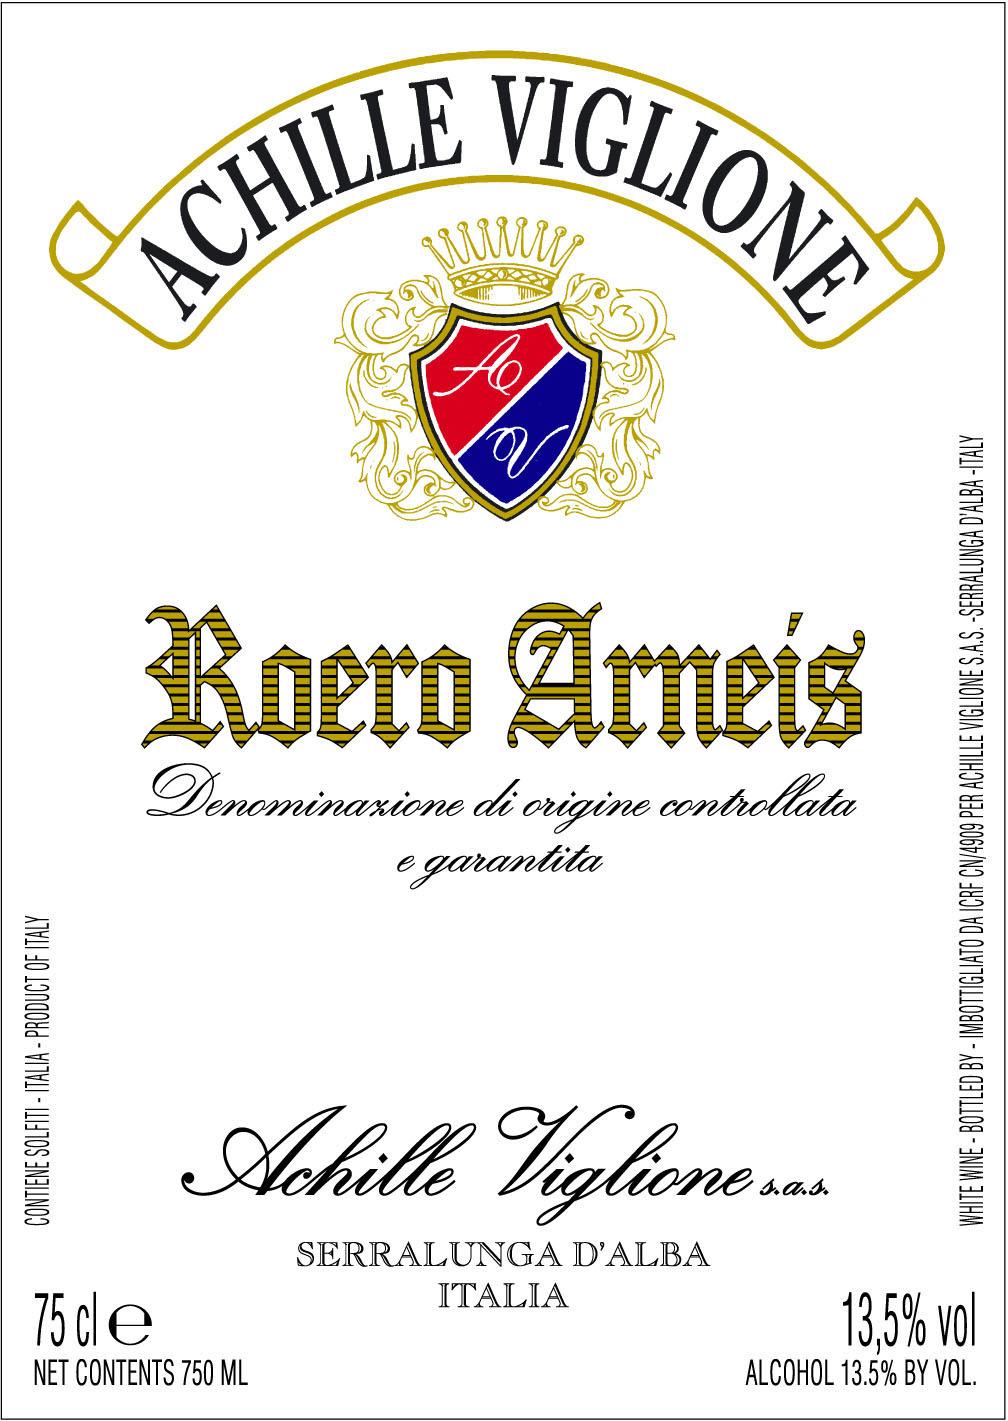 Etichetta vino bianco Roero Arneis Achille Viglione